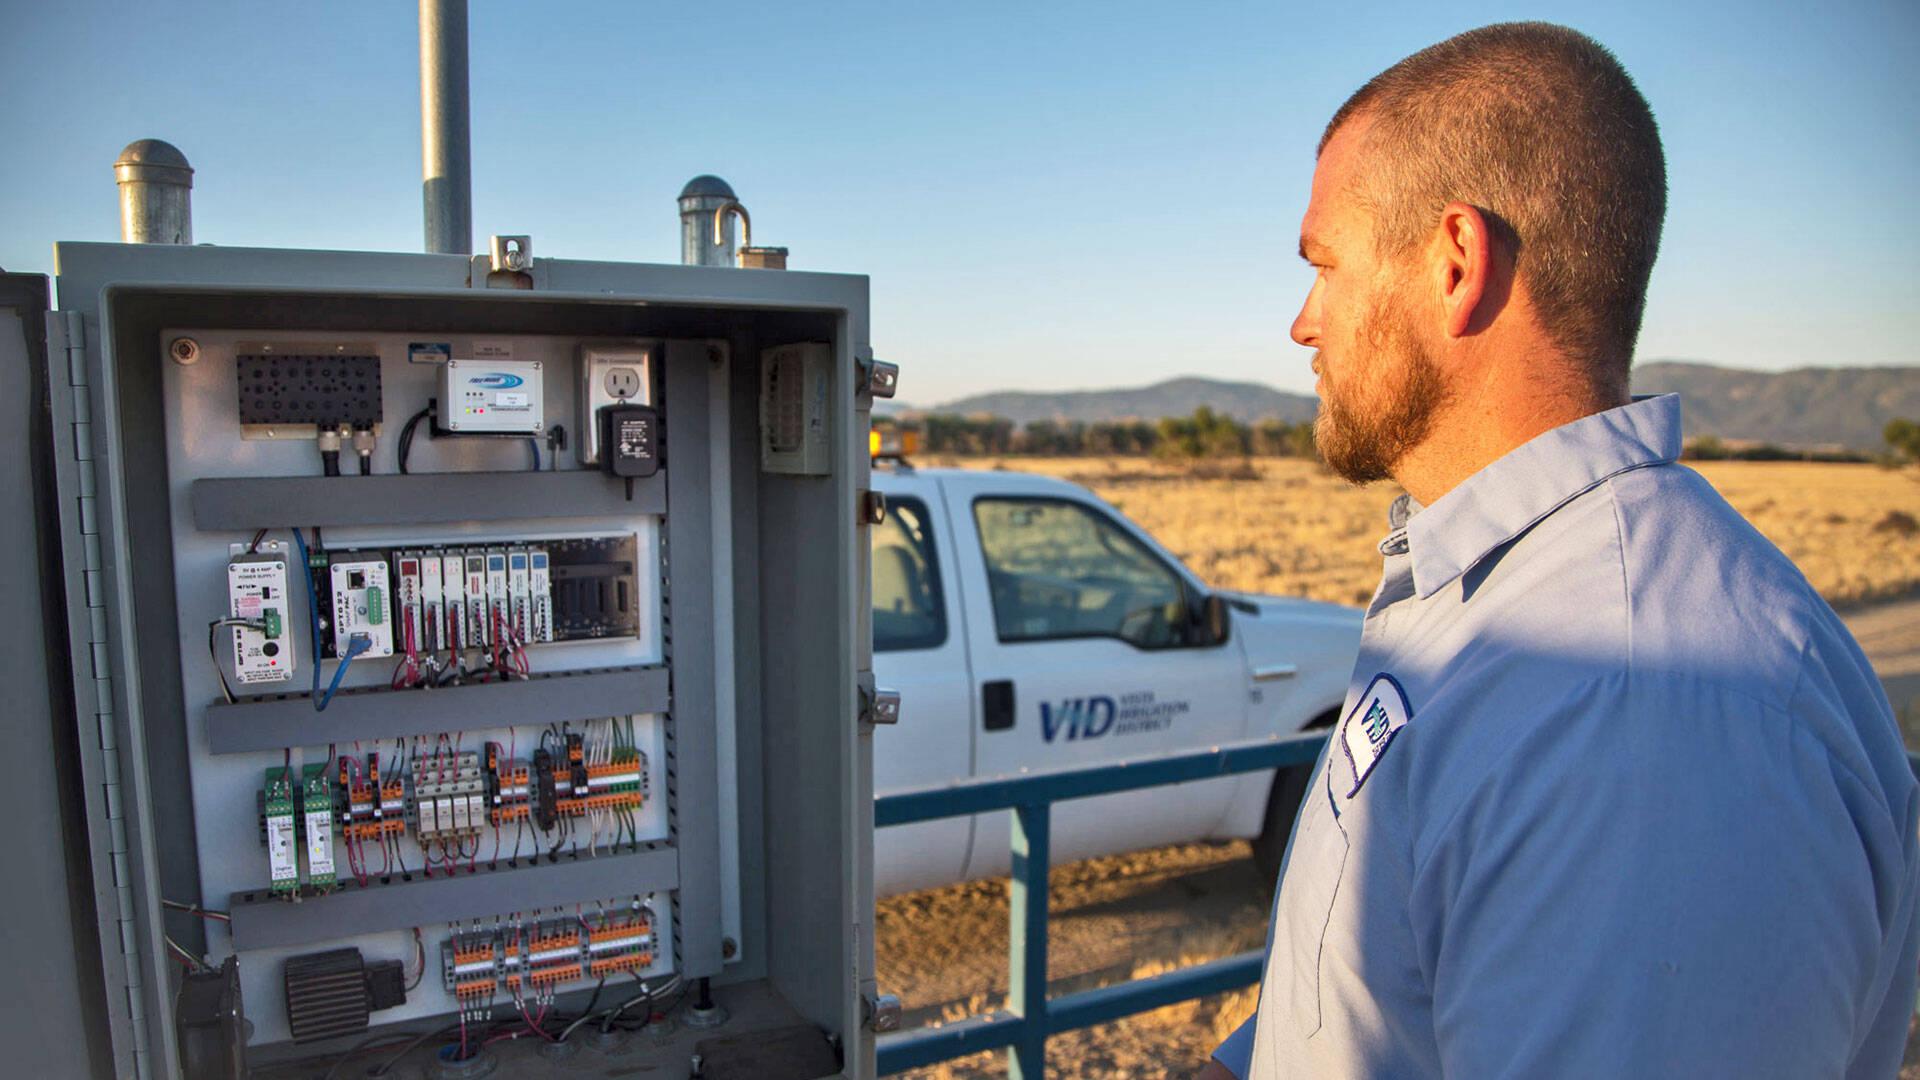 Vista Irrigation District Case Study